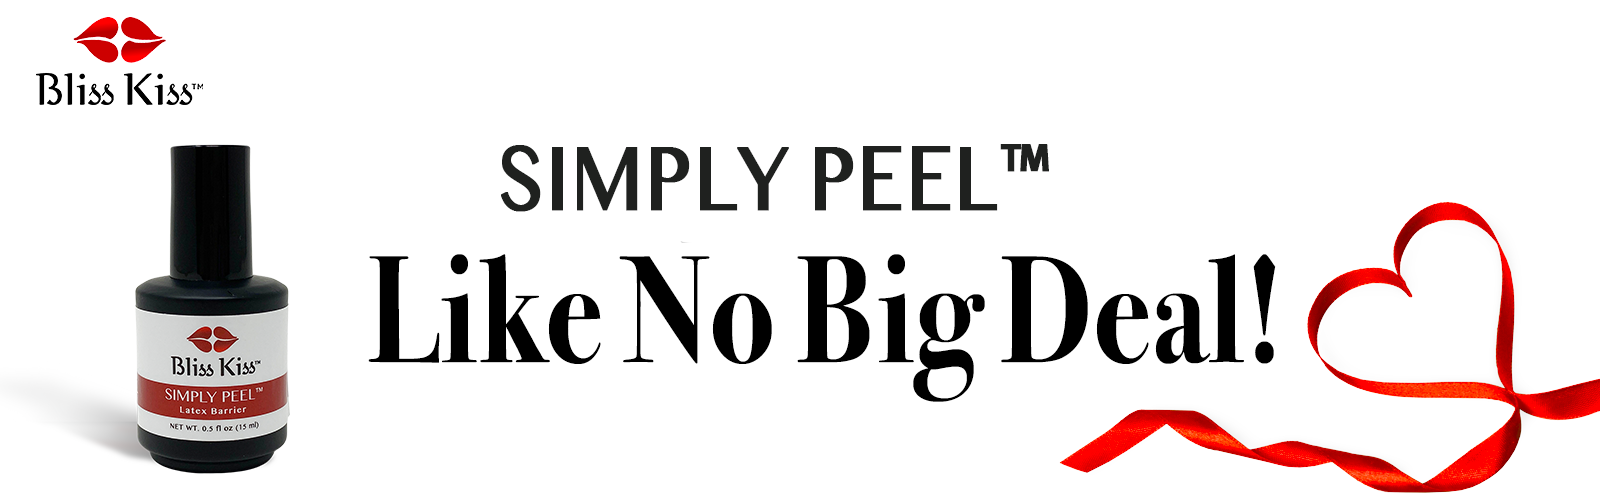 simply-peel-banner-.png